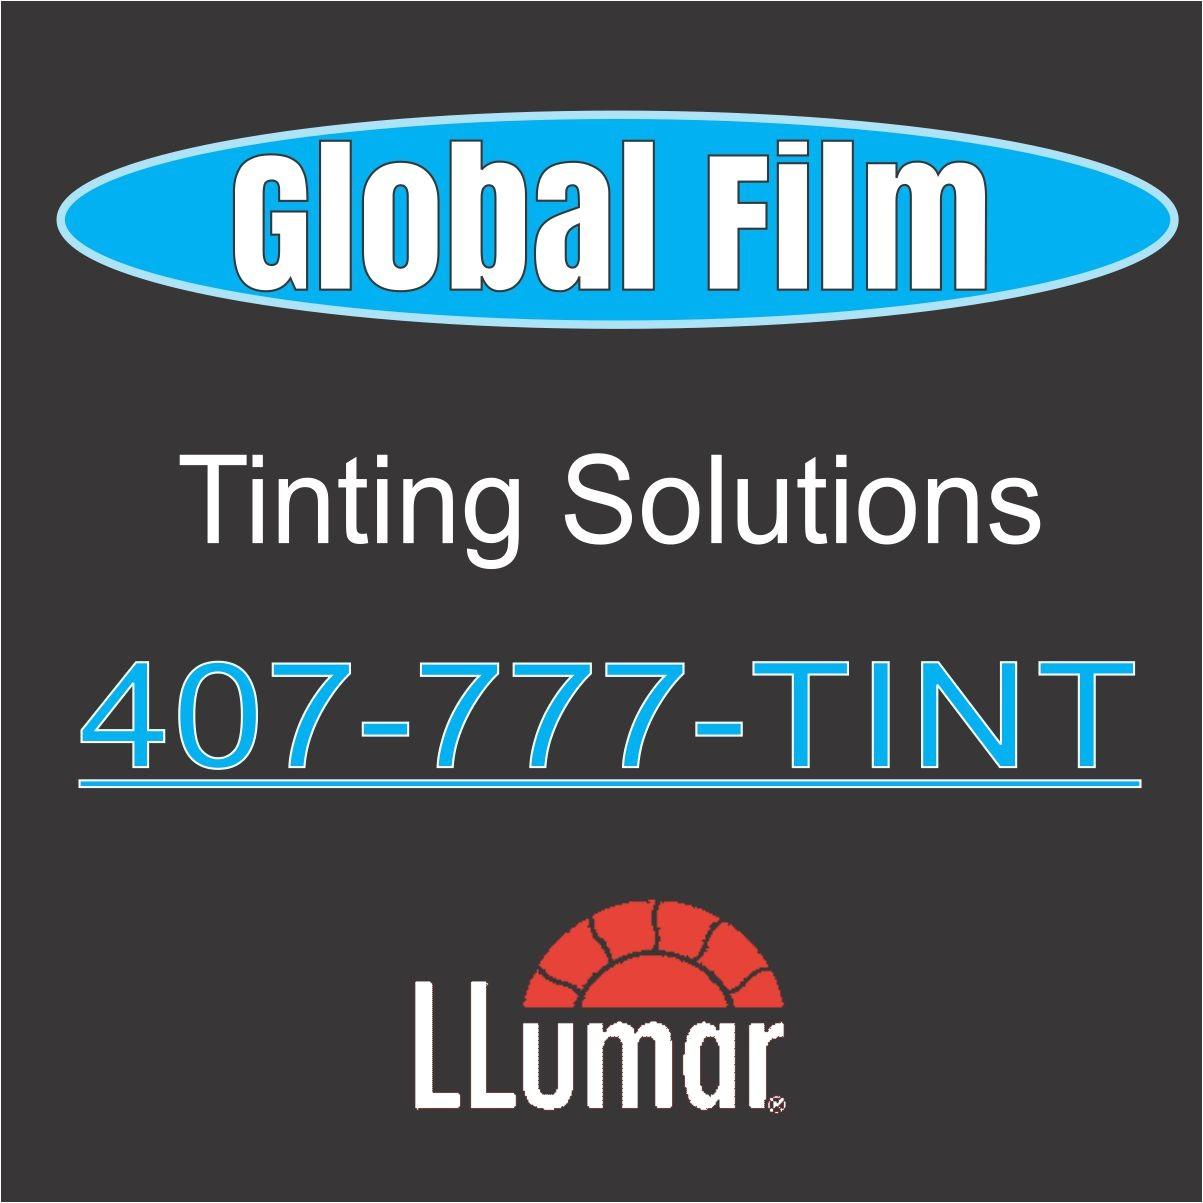 41121069 global film tinting